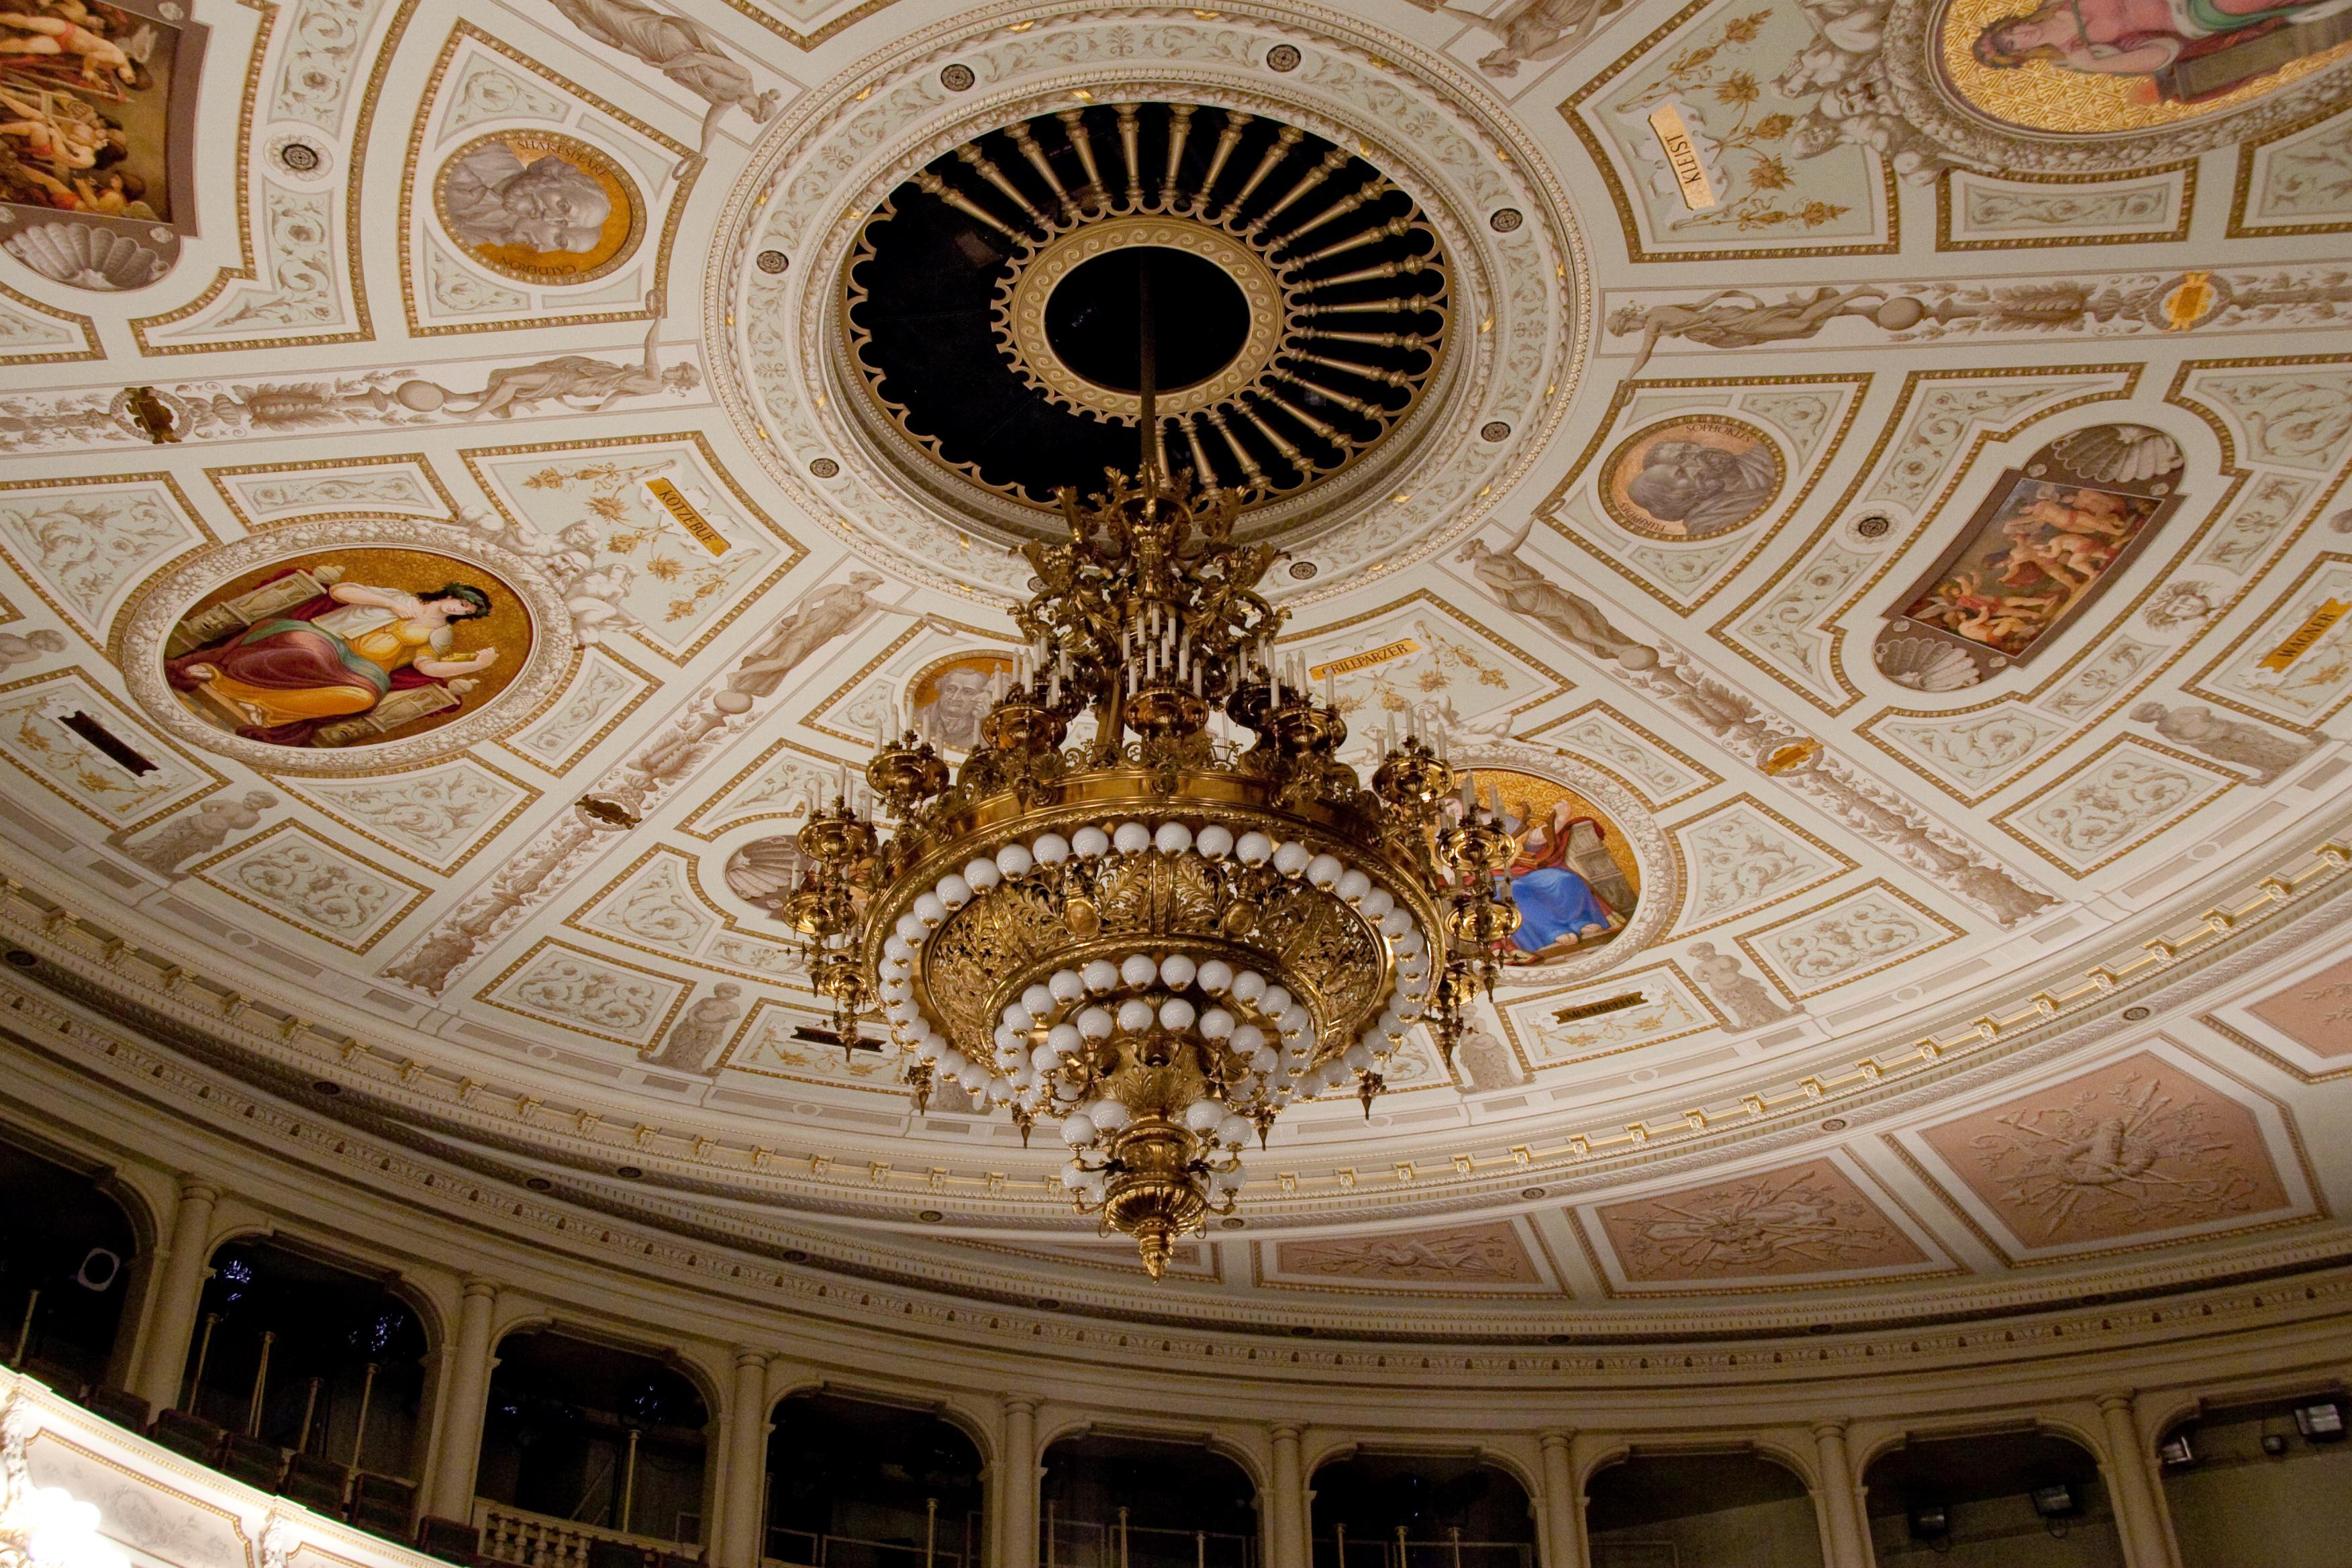 File:Semperoper Interior - 4, Dresden.jpg - Wikimedia Commons